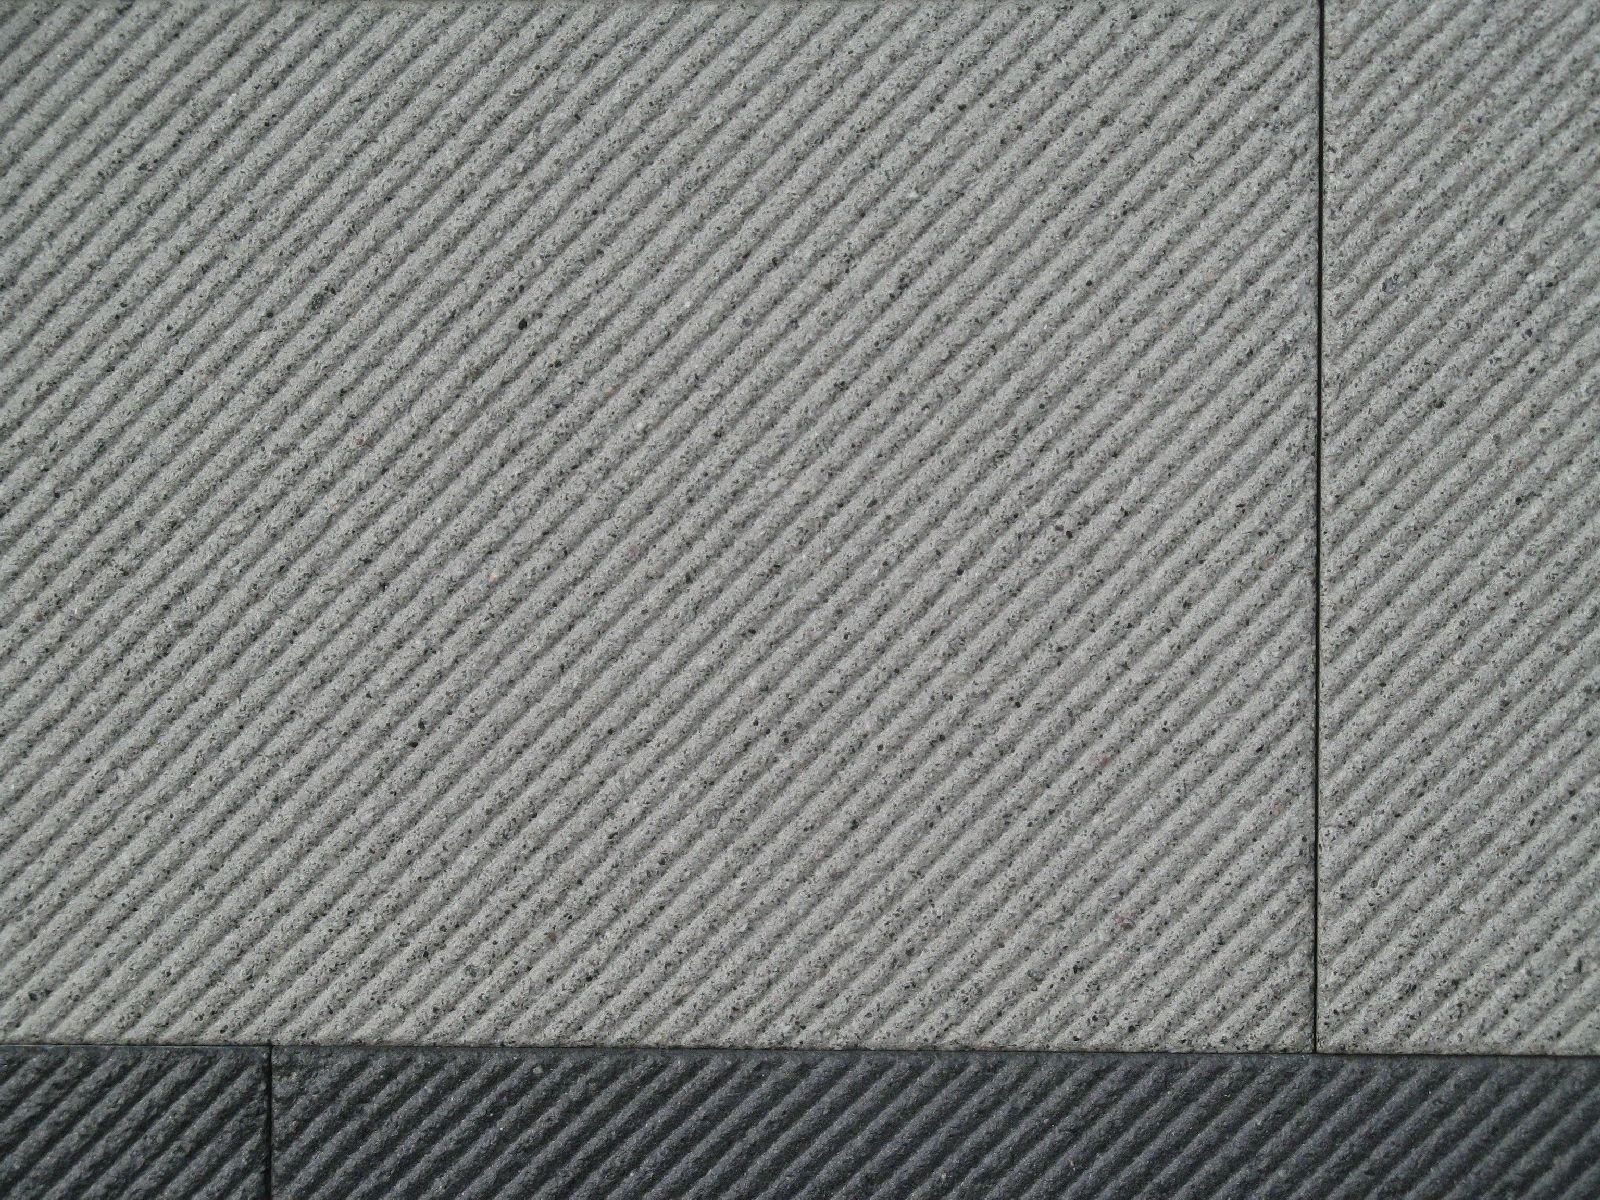 Stone_Texture_B_2954